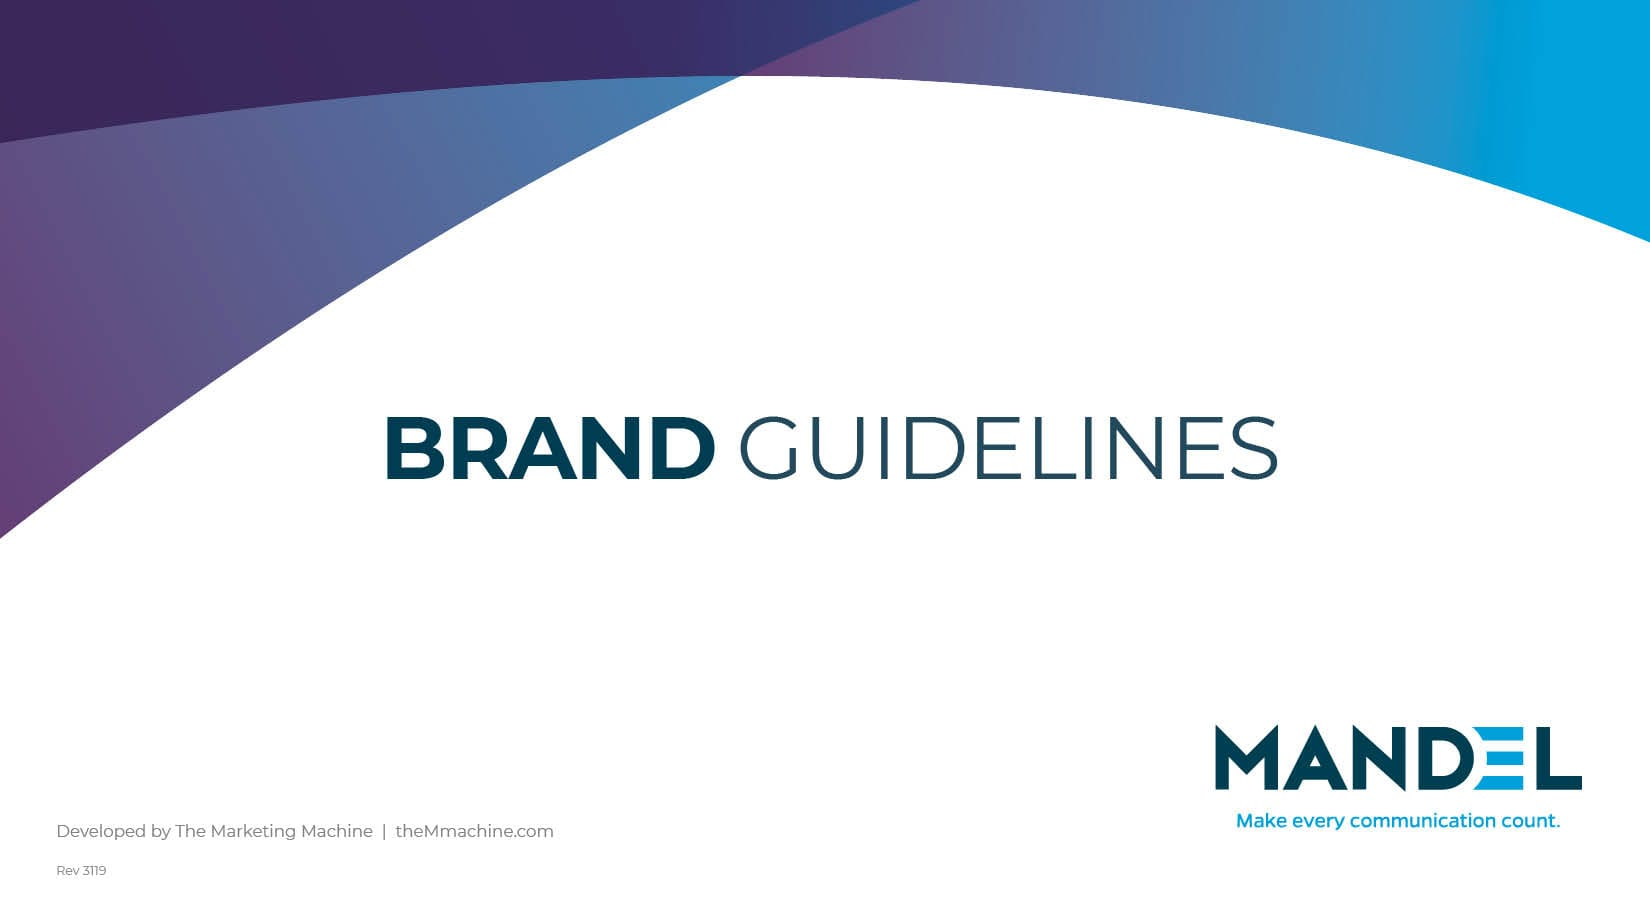 company rebranding, The Marketing Machine